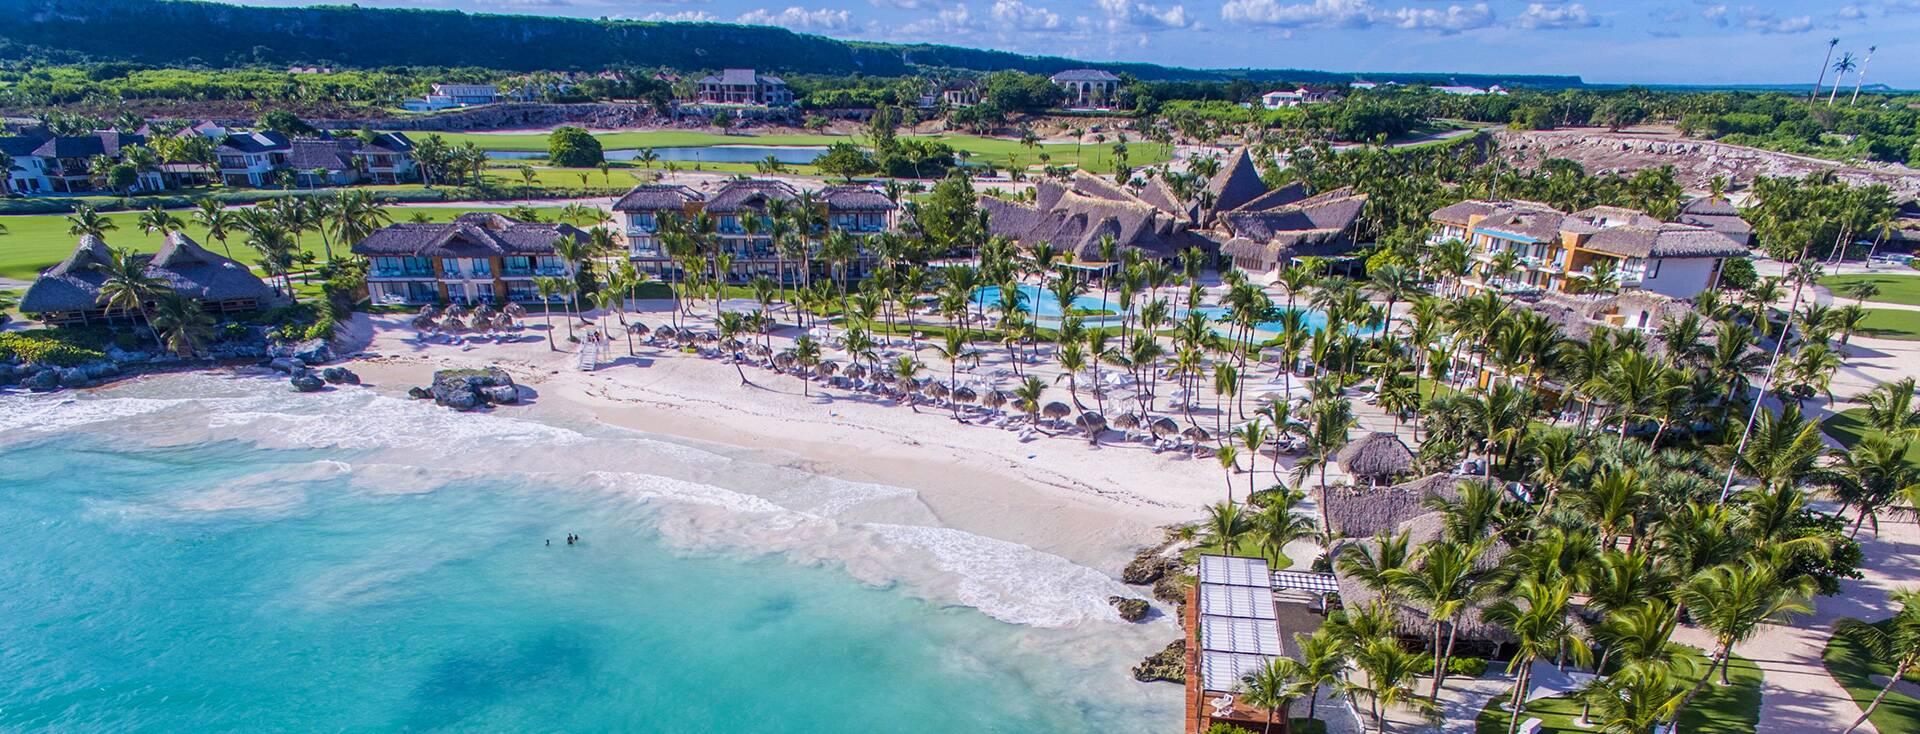 Cap Cana возобновила строительство отелей и вилл в Доминикане